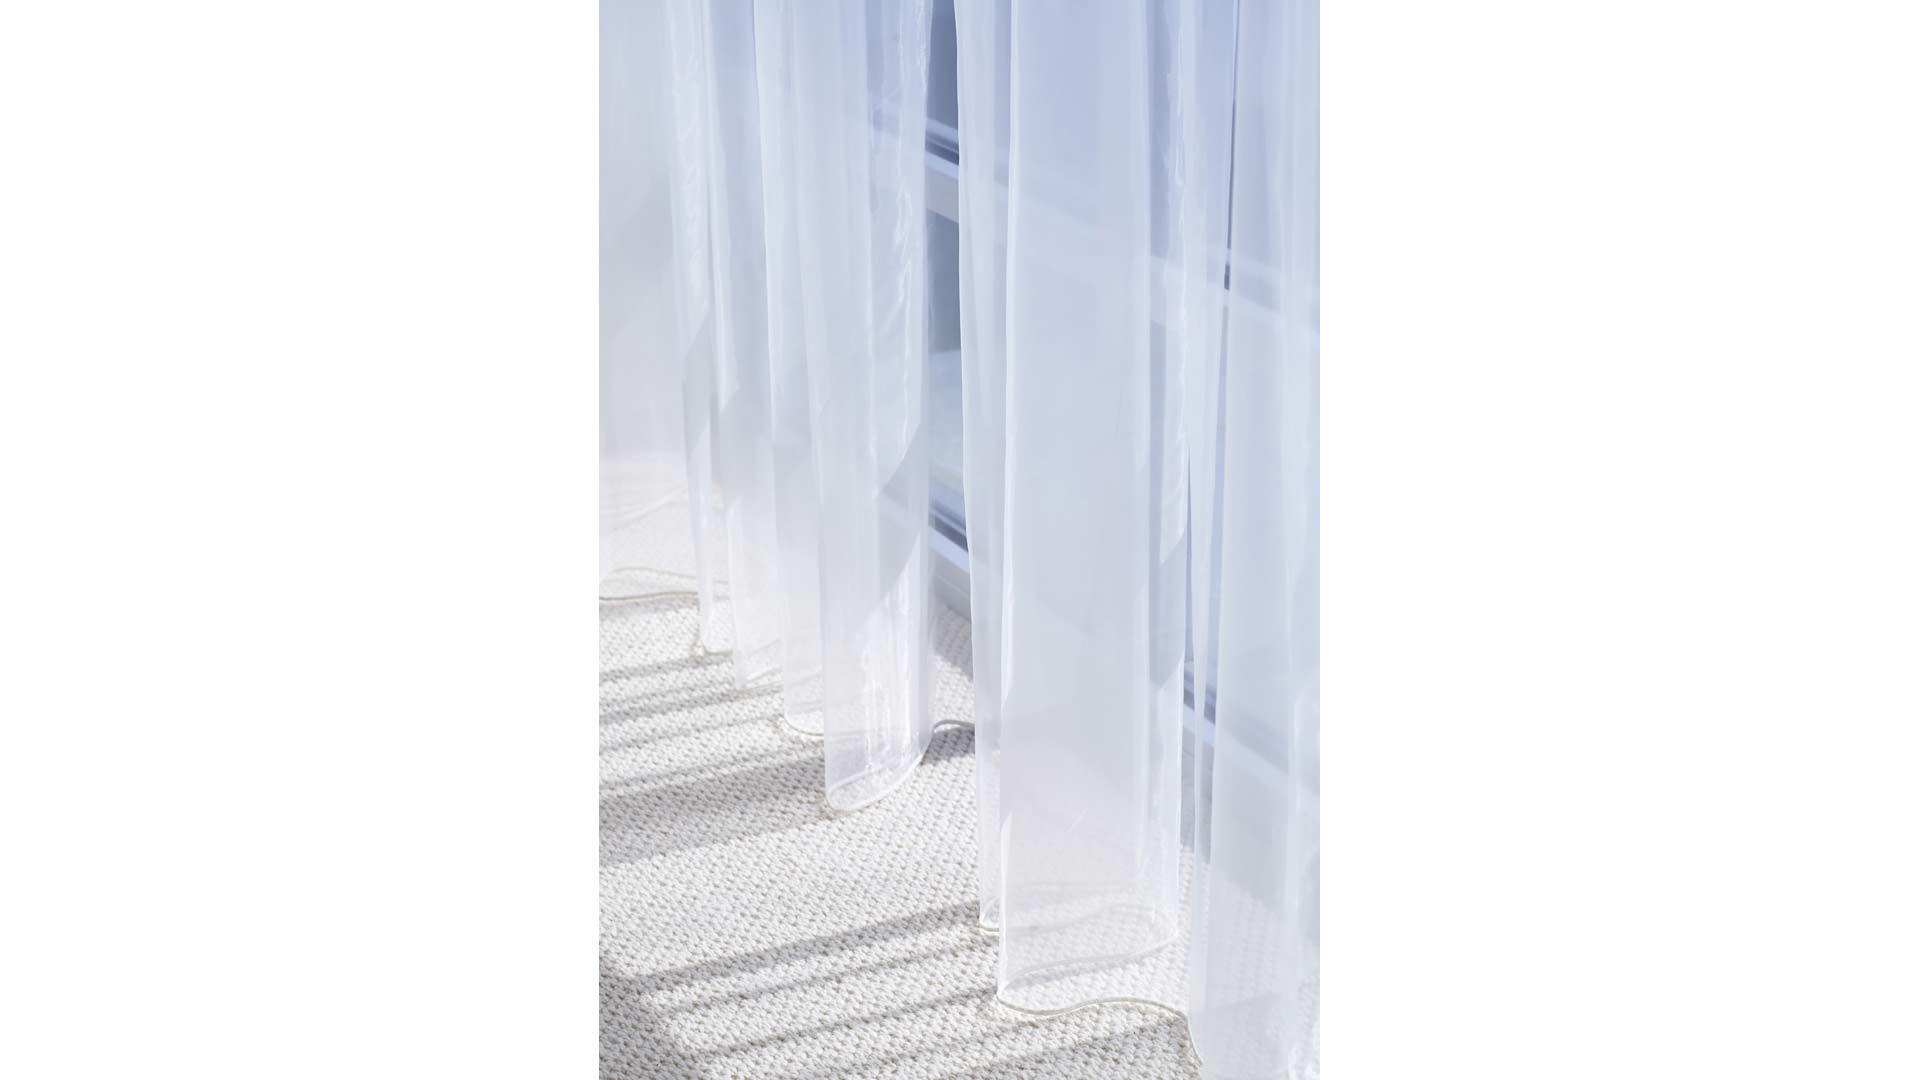 Adagio Penthouse Interior - Master Bedroom Sheers - HAUS Architecture, Christopher Short, Indianapolis Architect